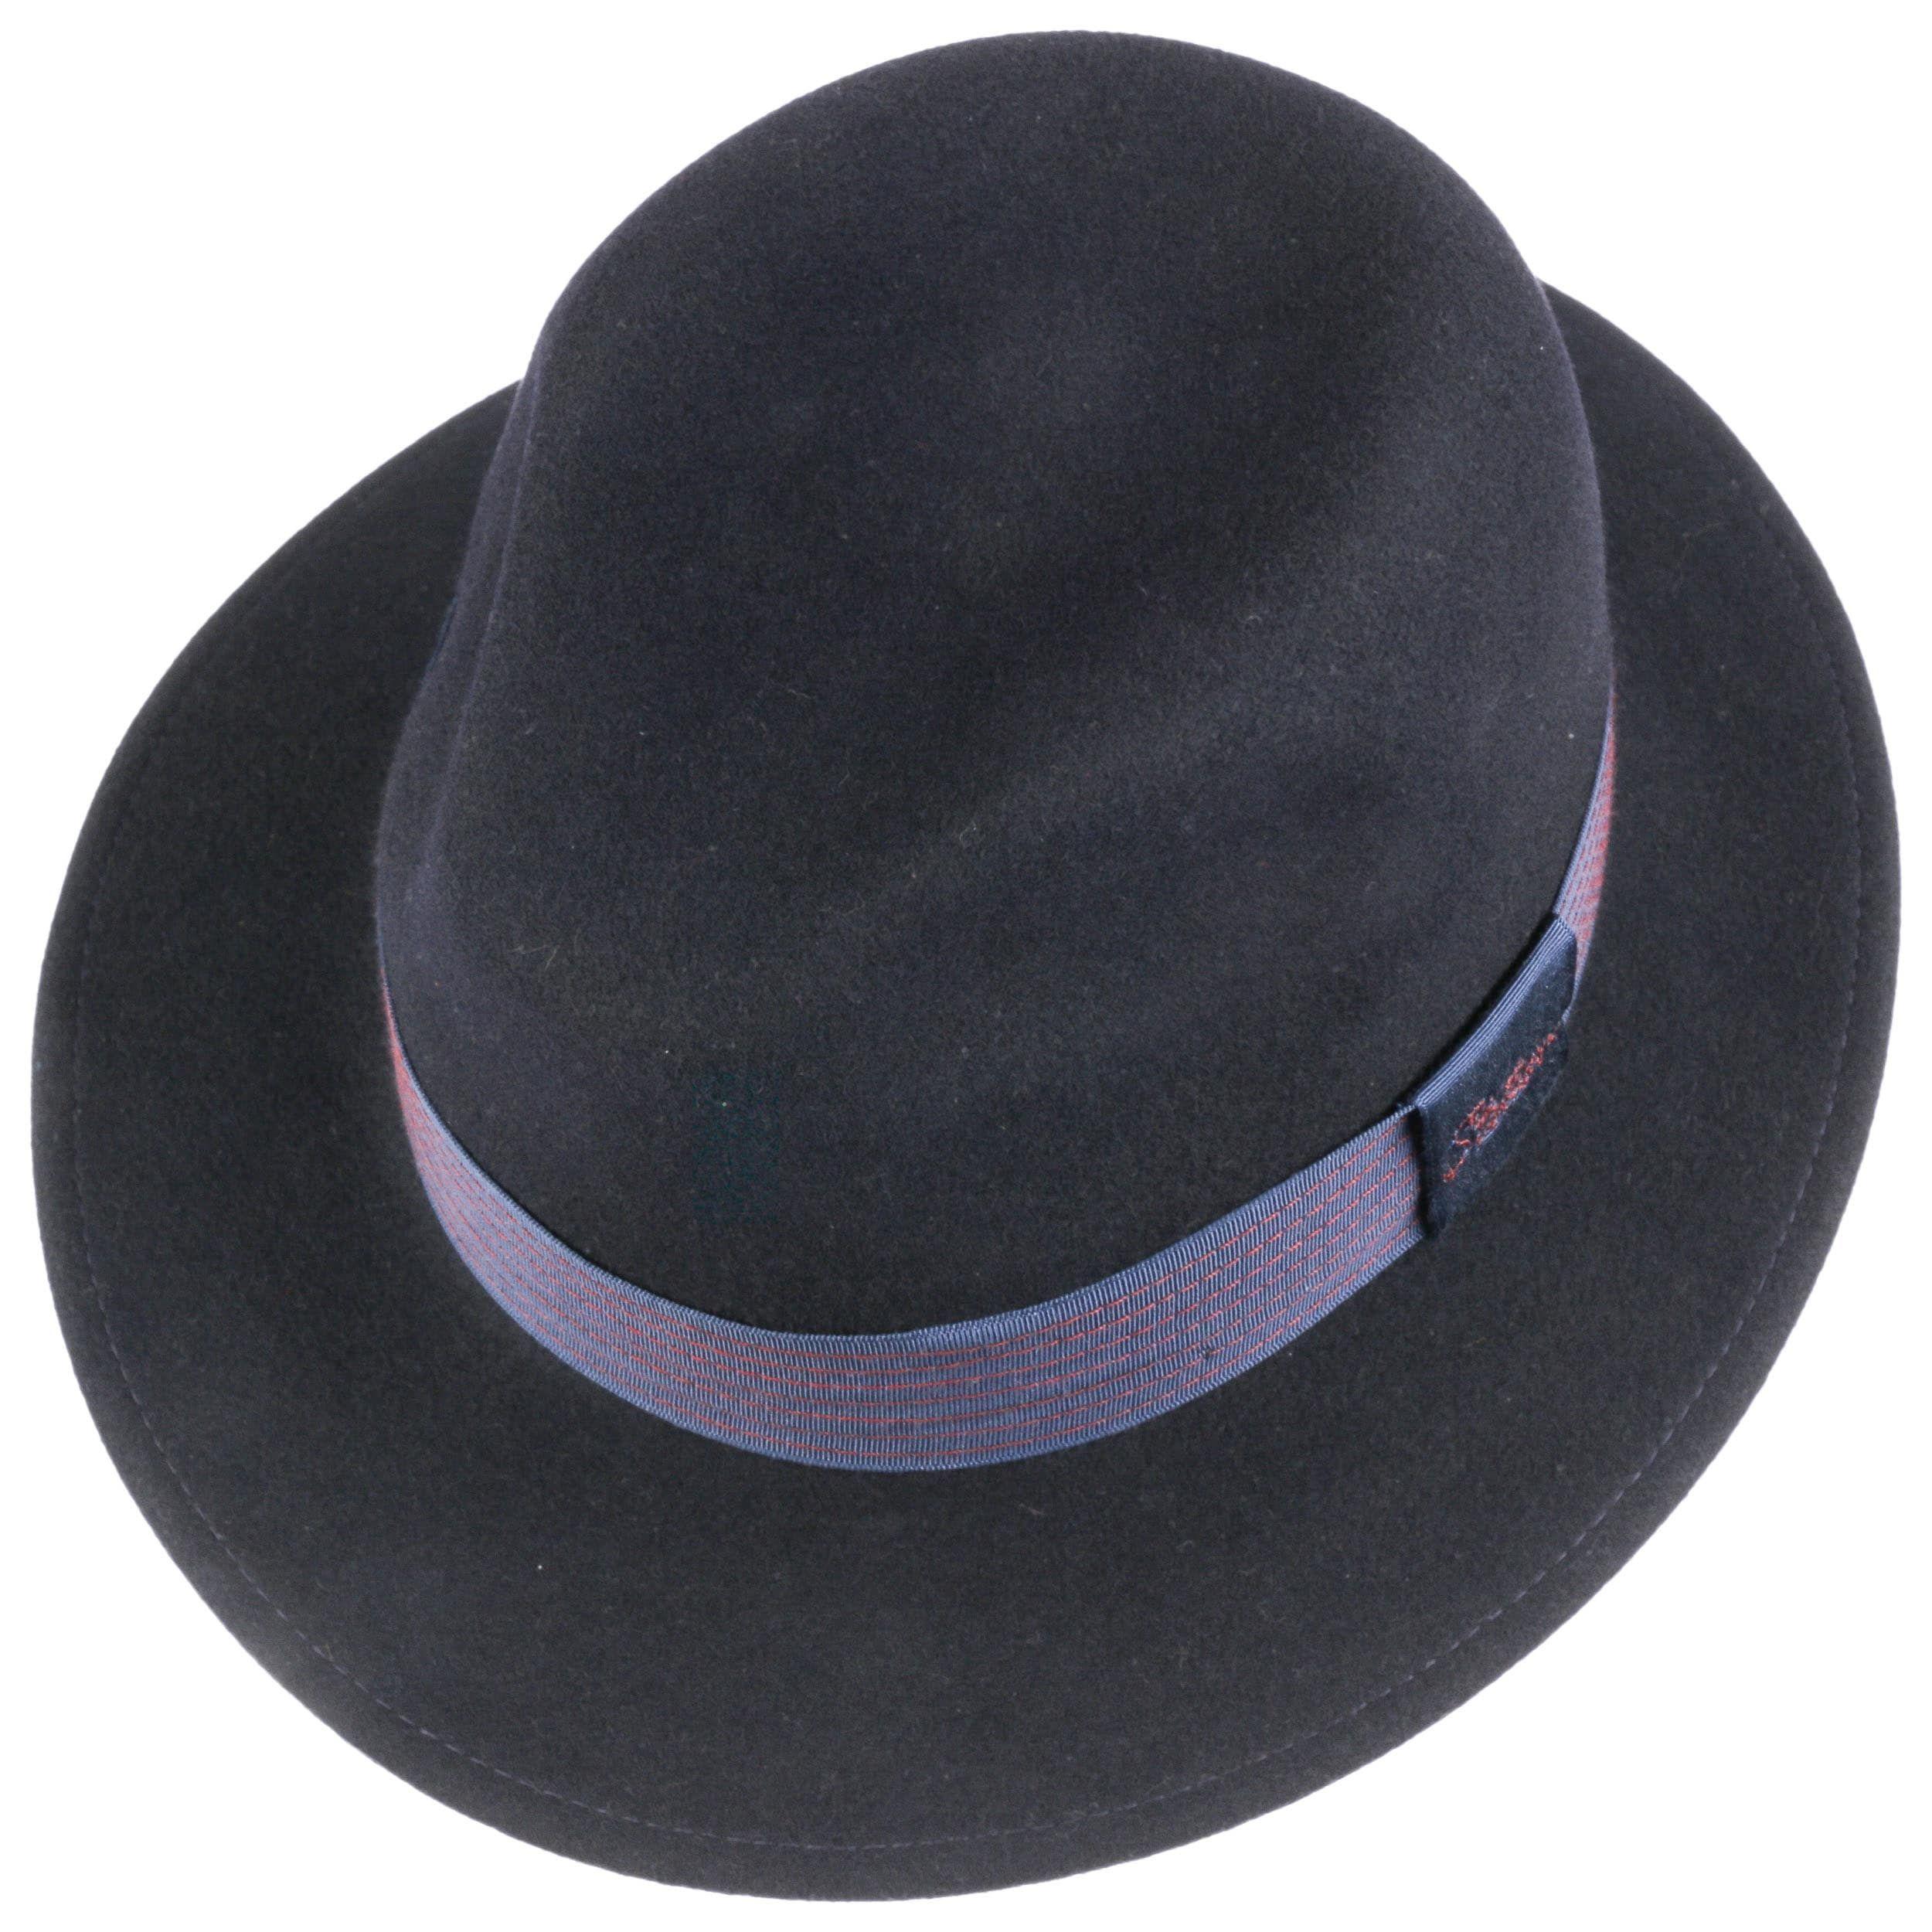 Brockledge VitaFelt Hat navy